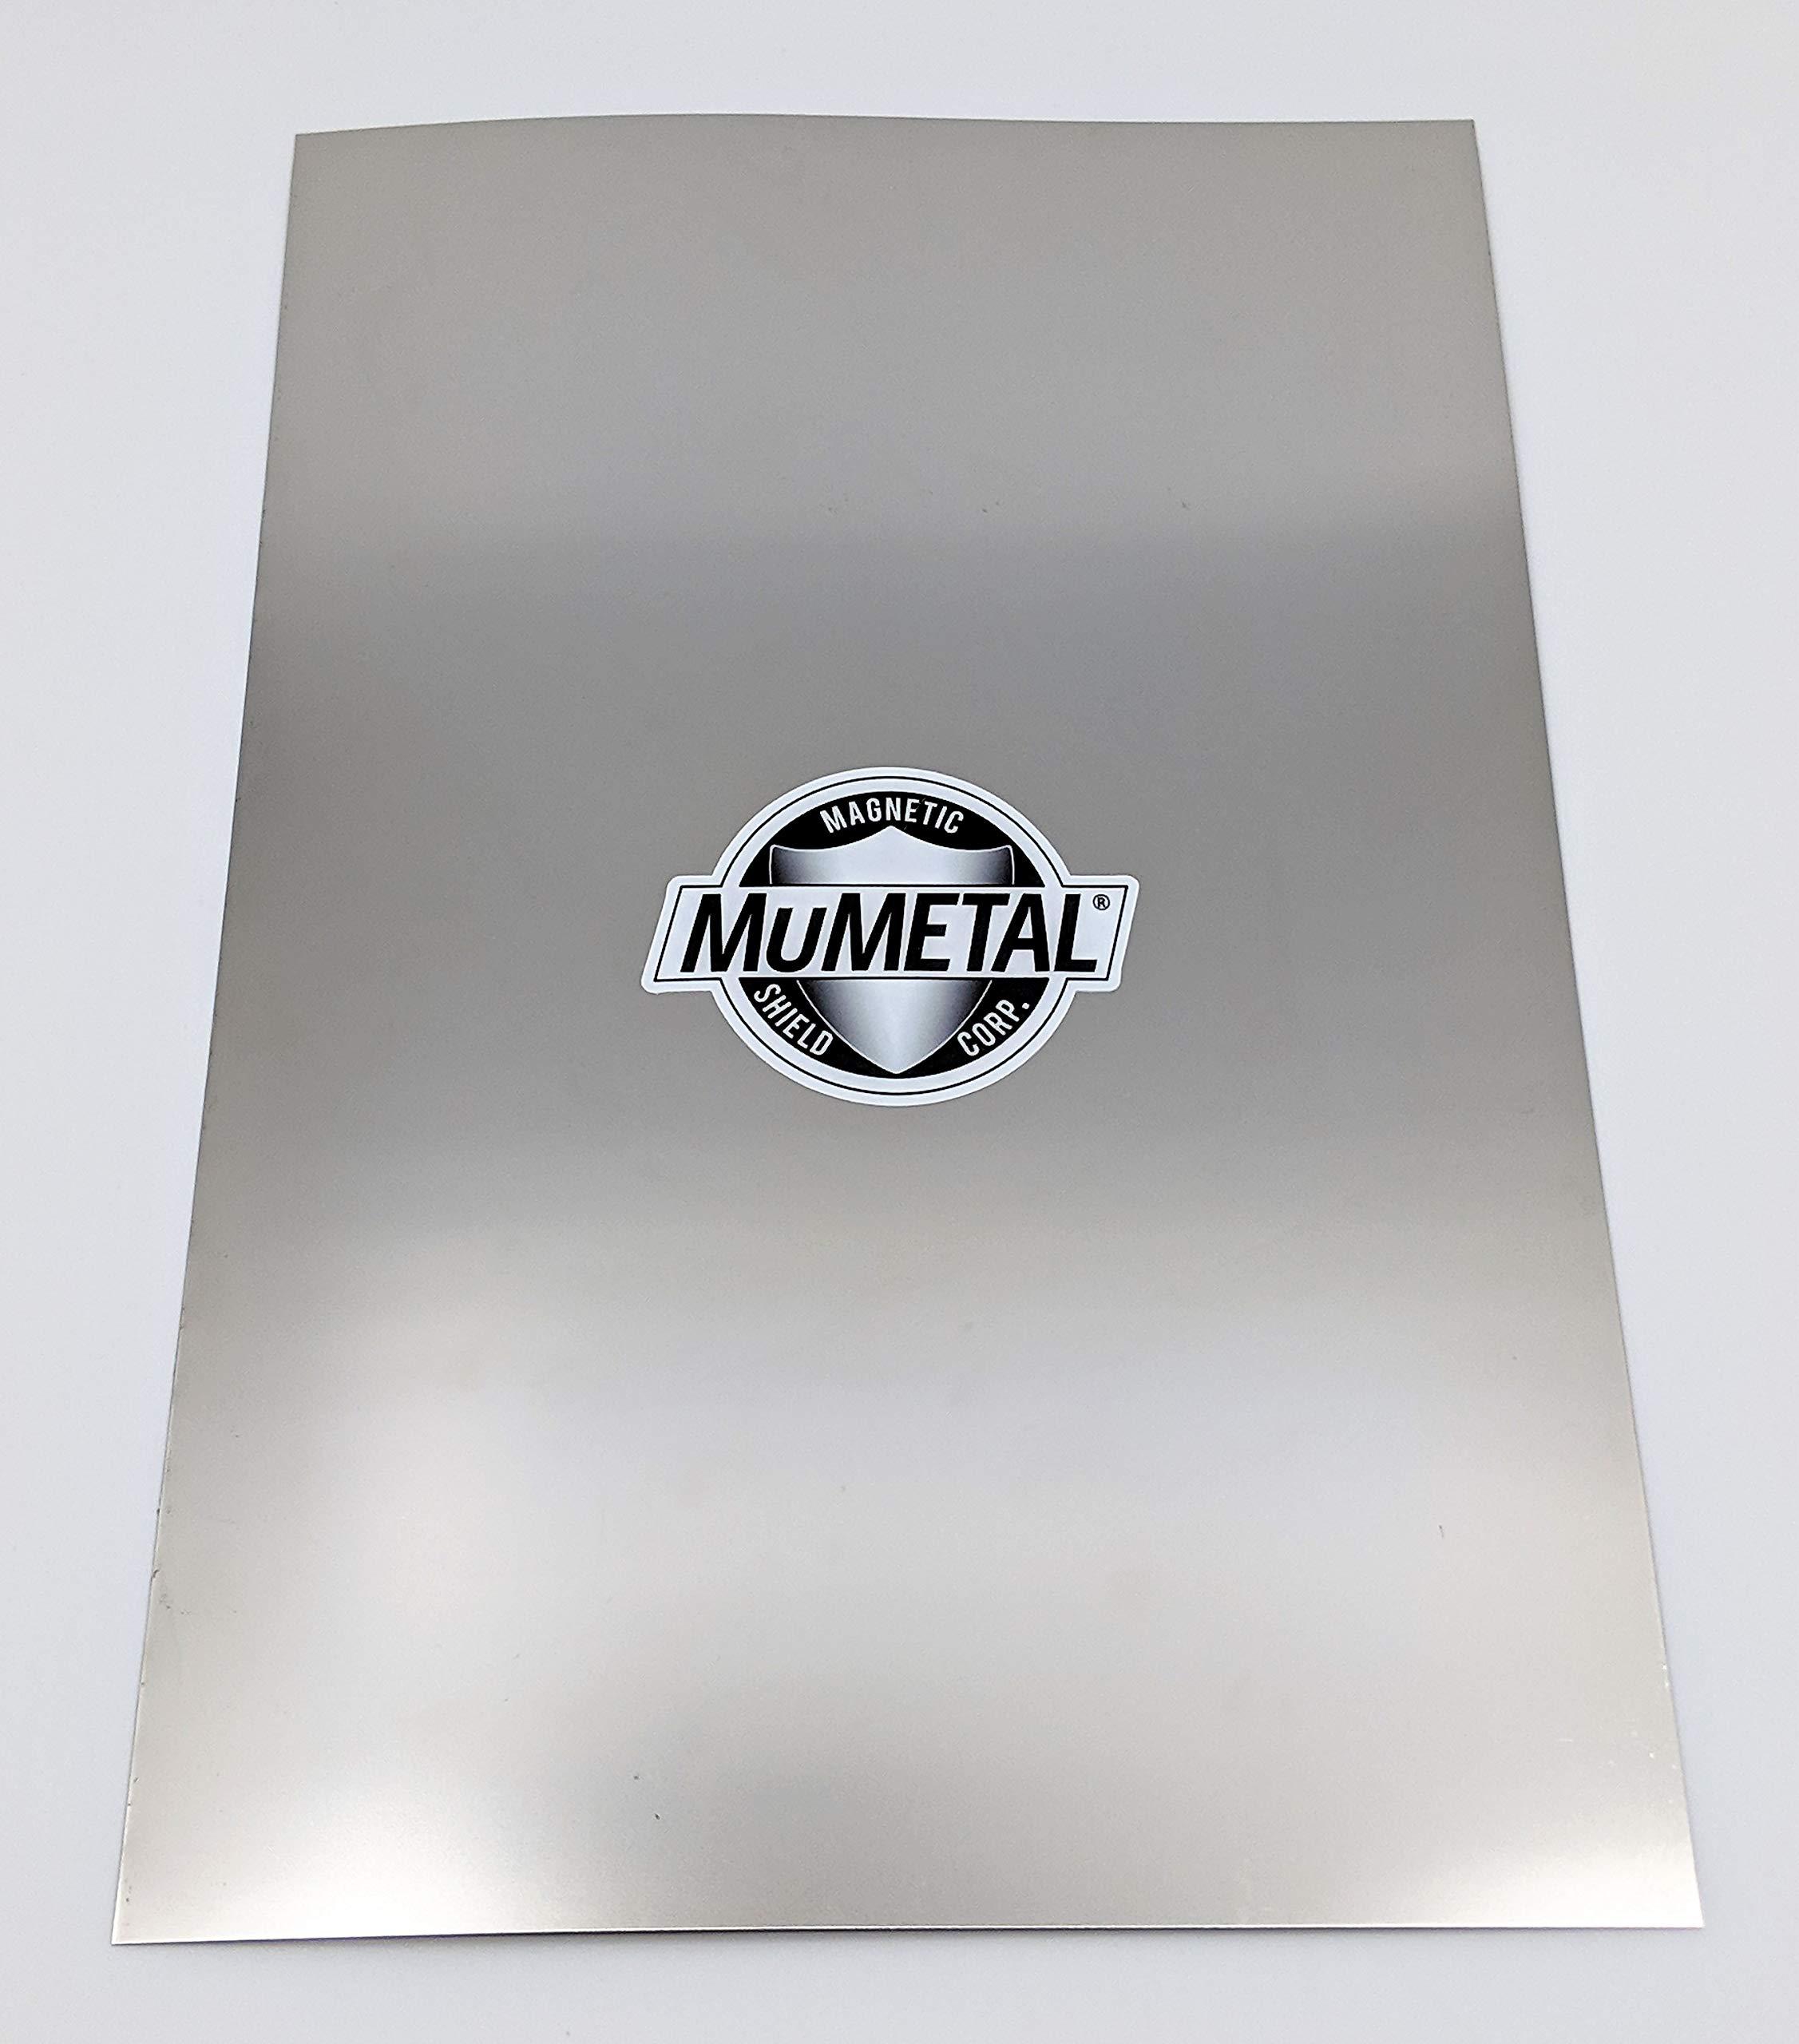 "MuMETAL Magnetic Shielding Foil .012"" Thick 8"" x 12"" Sheet"